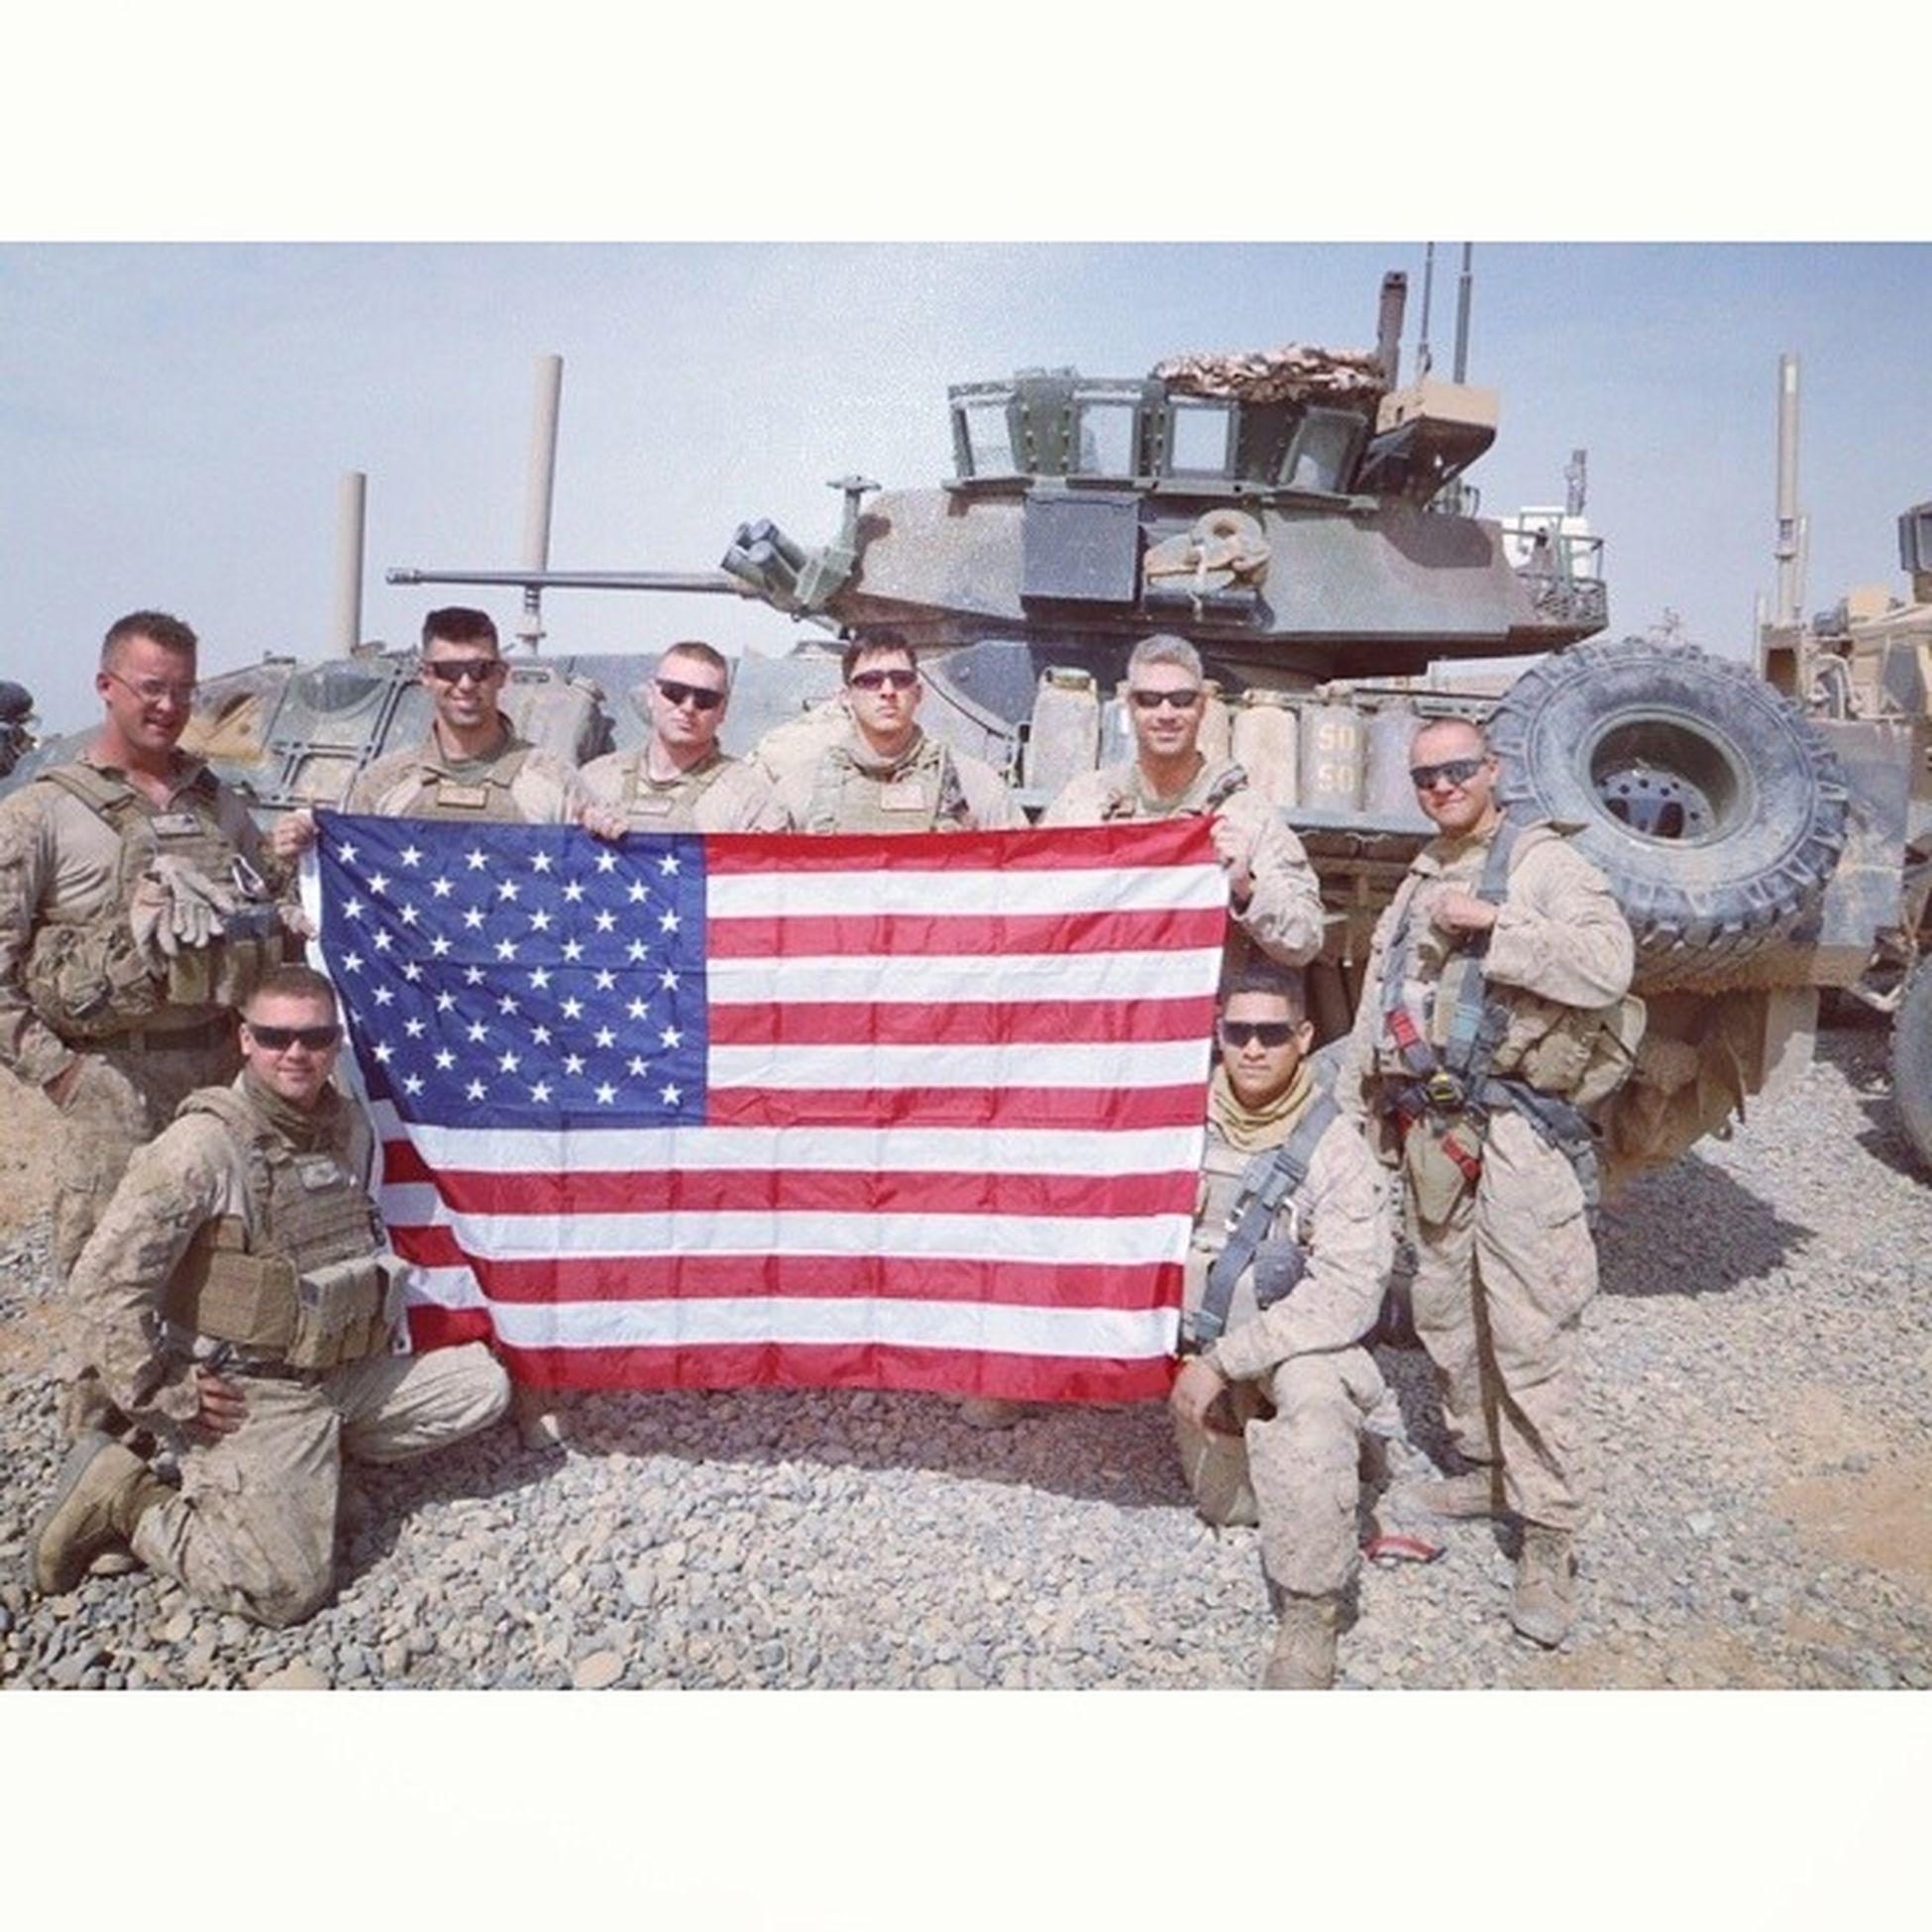 Posting up the flag in Helmand Afghanistan Fmf Corpsman proudveteran 1stMarineDivision Sardonabad downforafight gunfighters